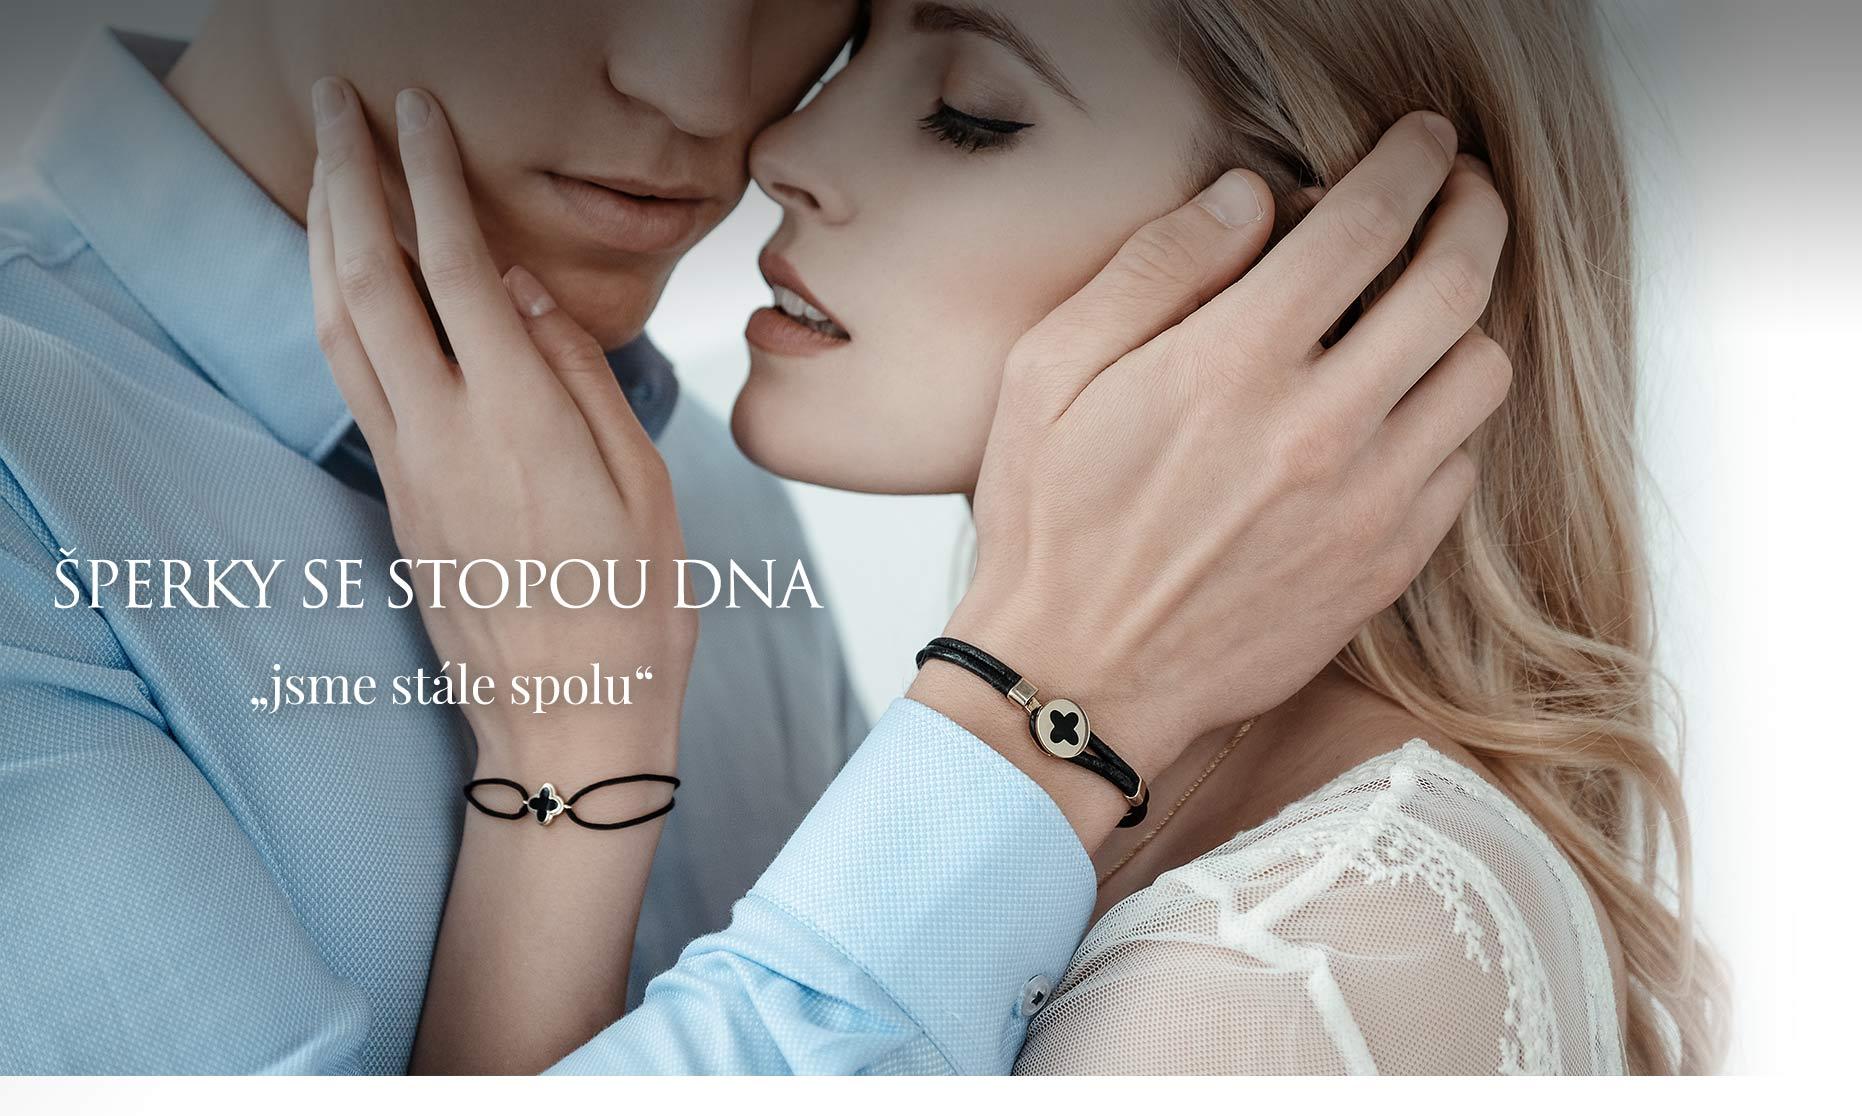 šperky s DNA